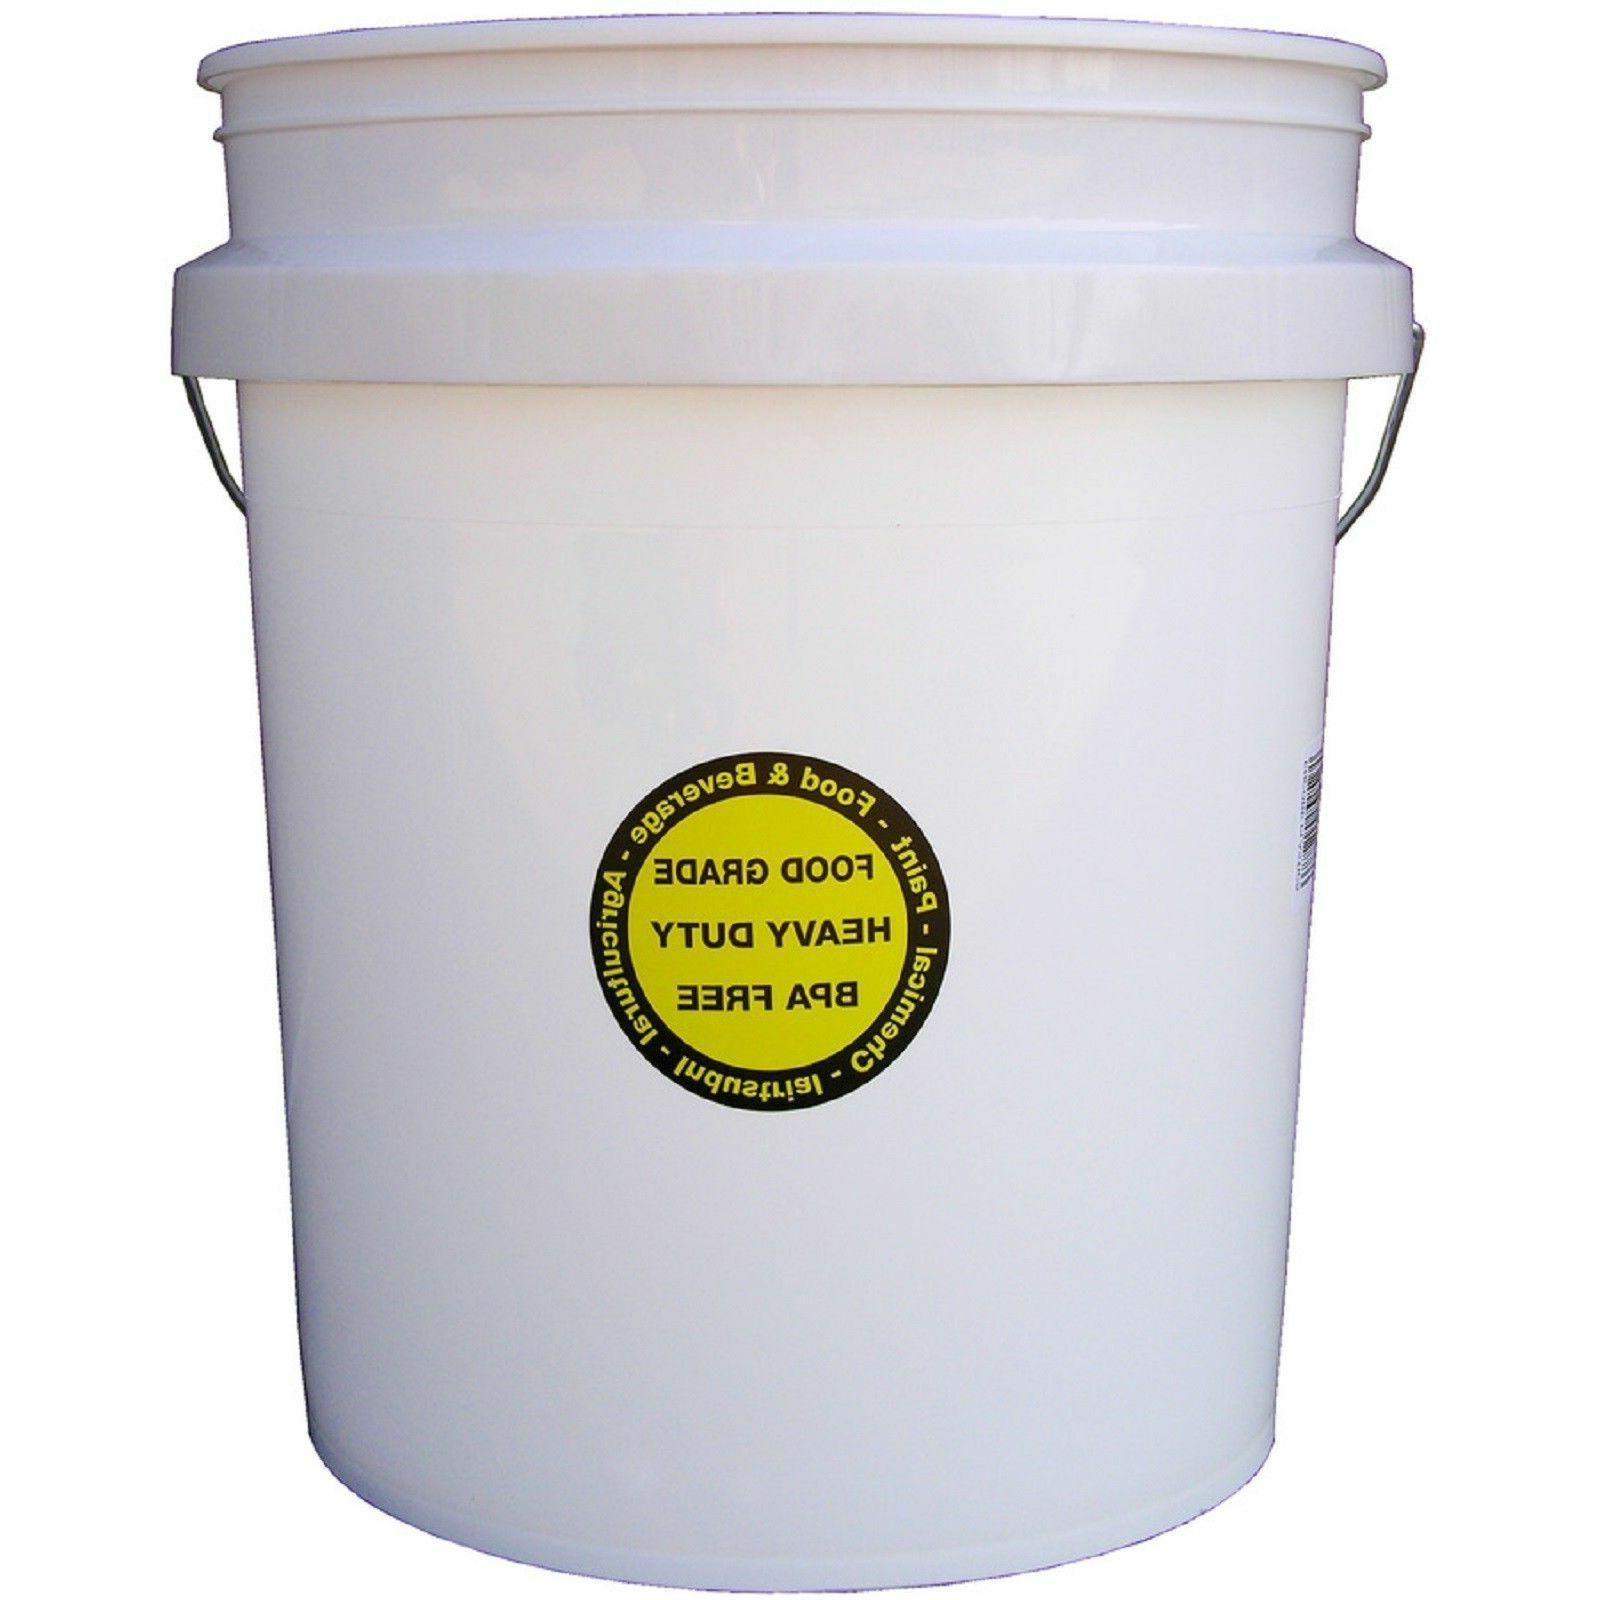 Bucket Lid Commercial Food Plastic Pail